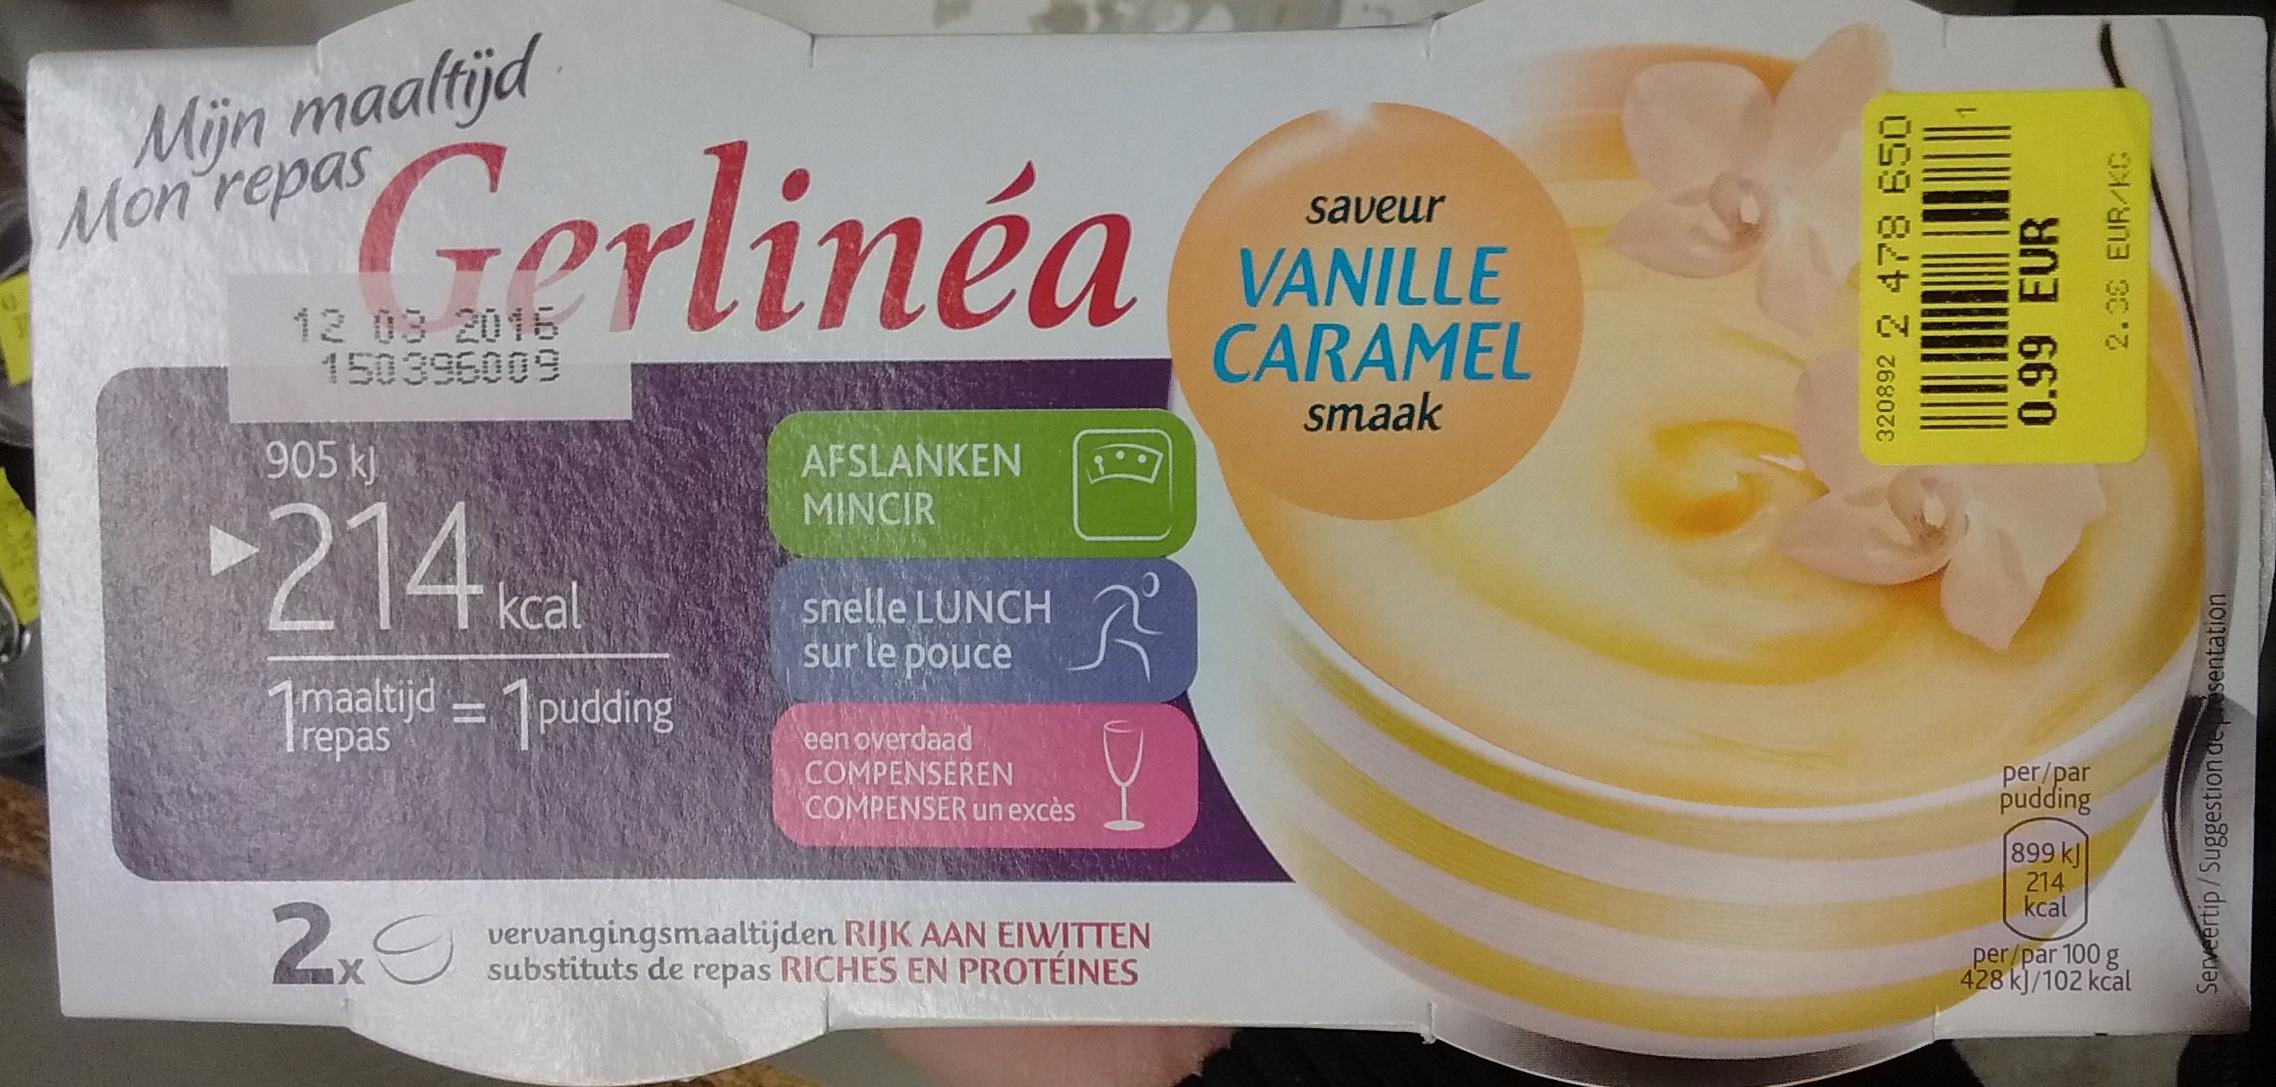 Mon repas saveur Vanille Caramel - Product